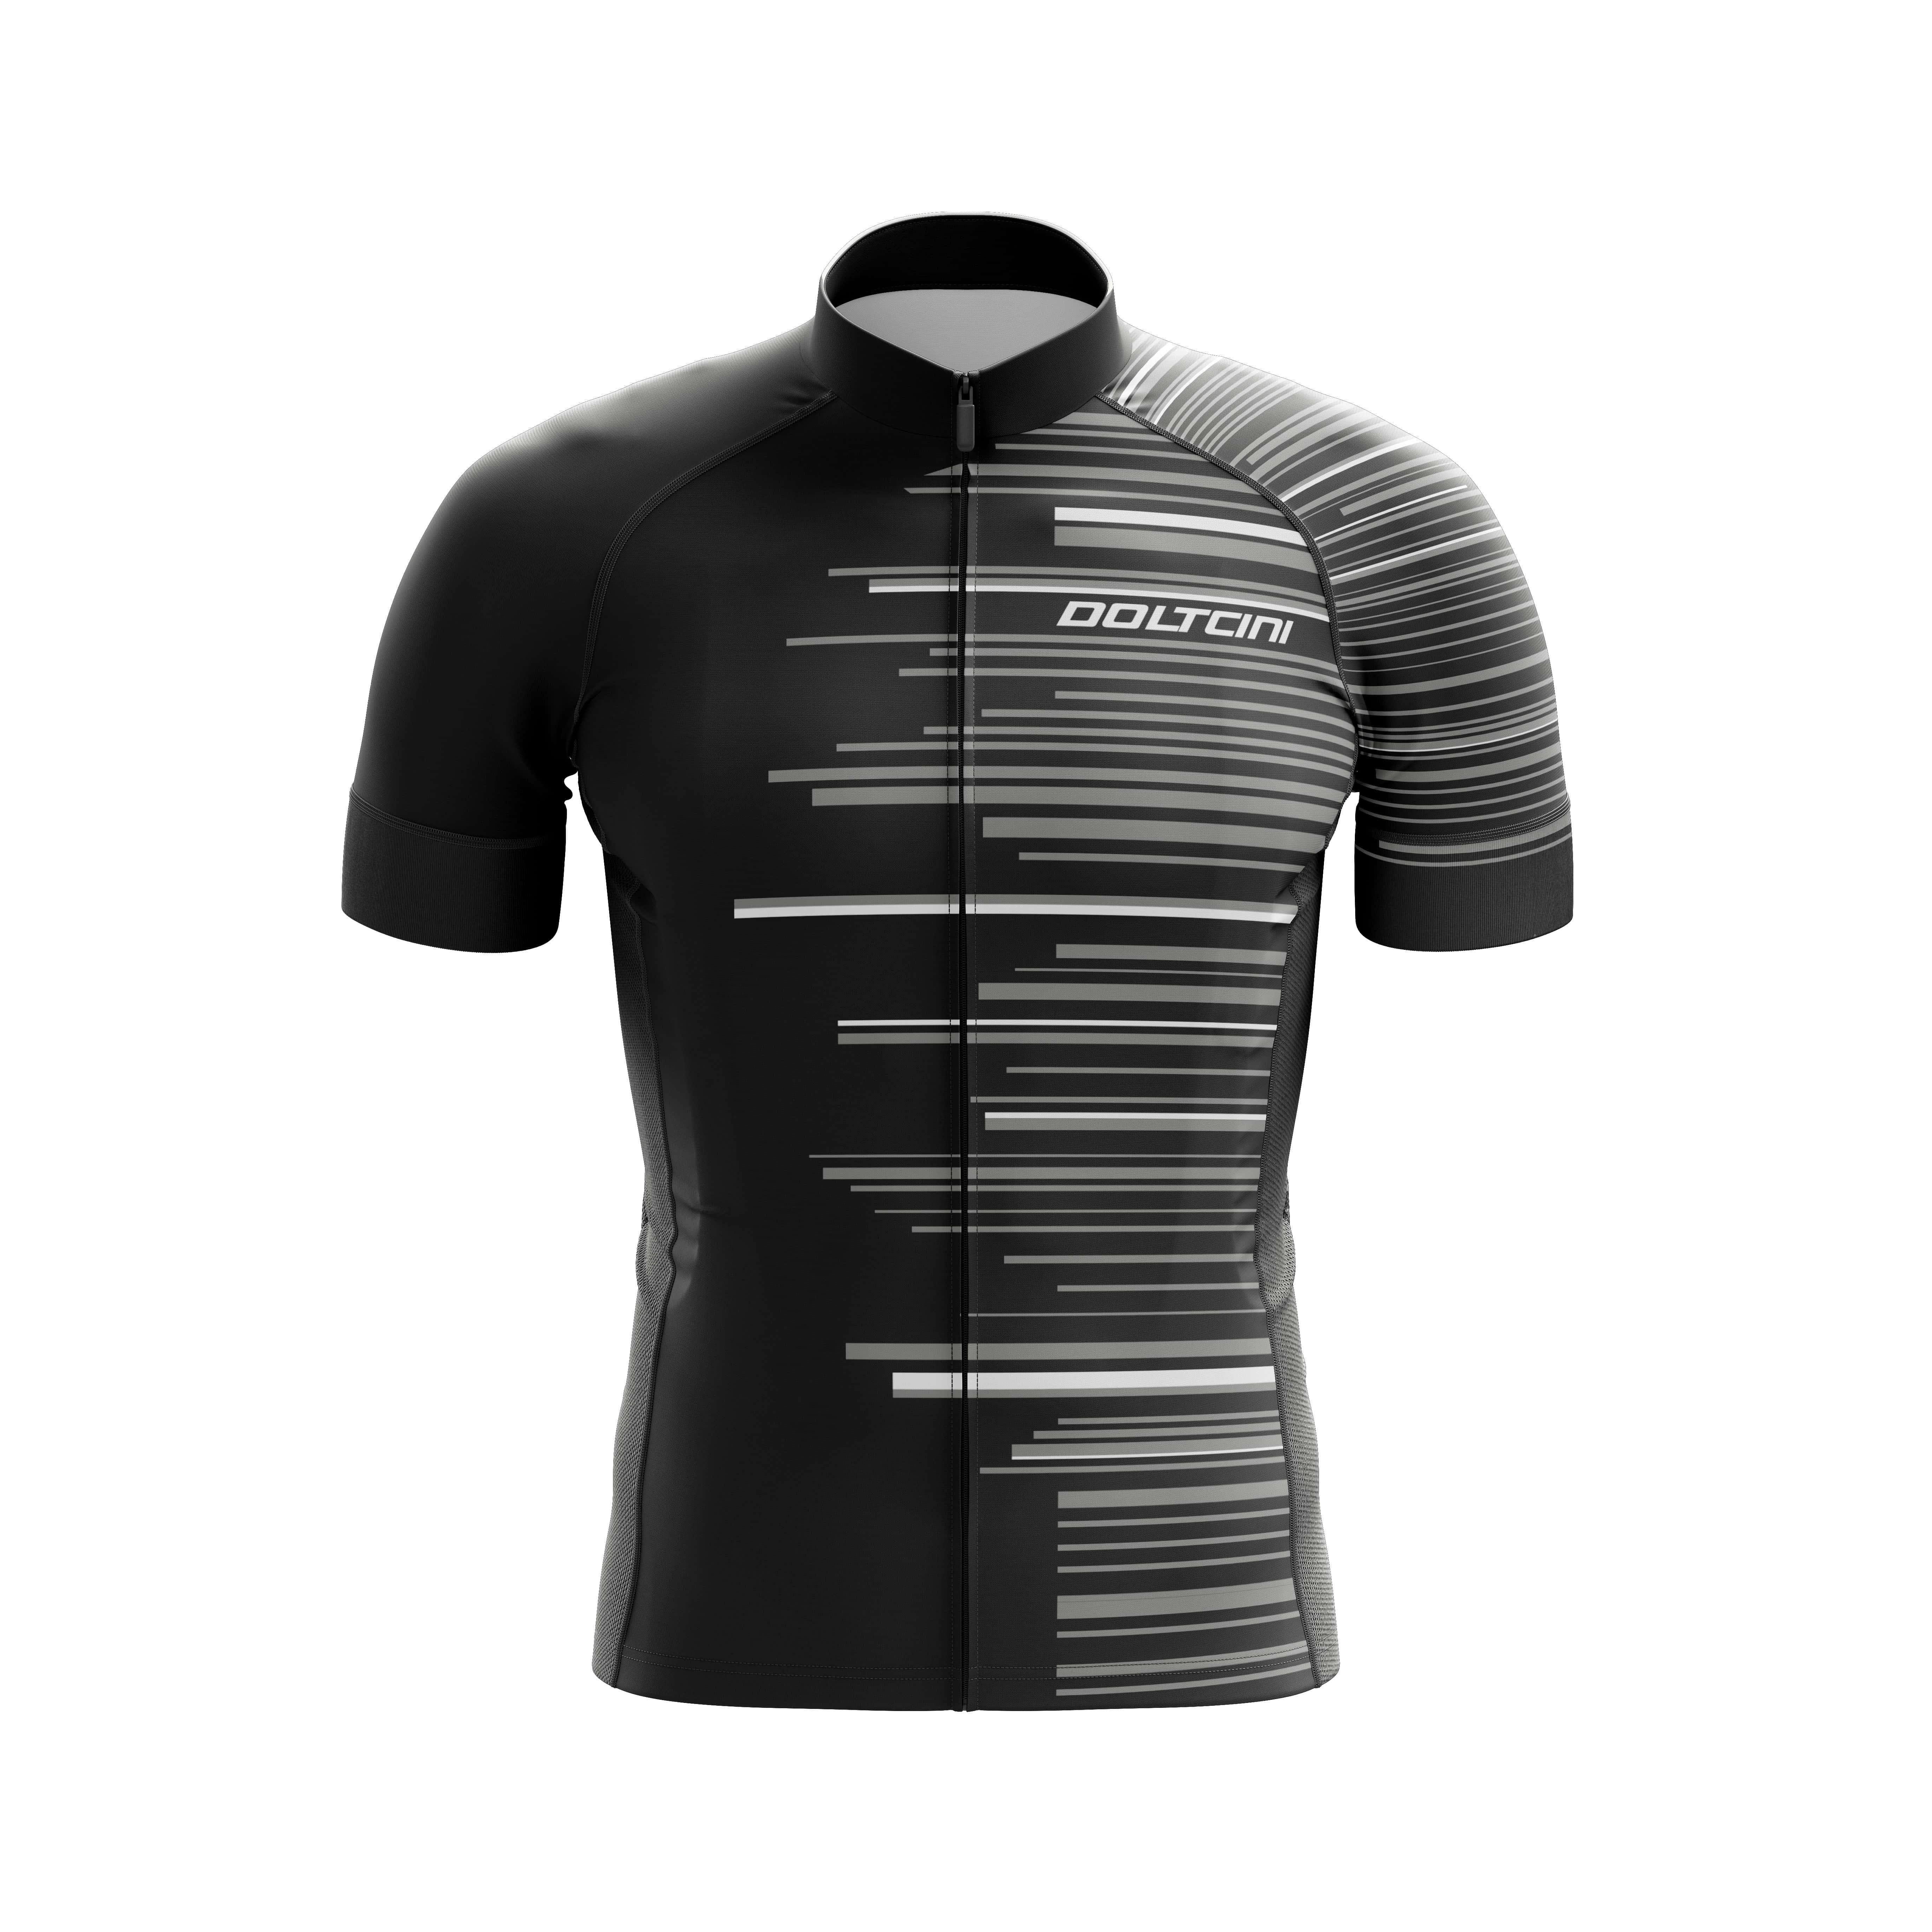 Shirt 3D Doltcini GANNON Grey black-min